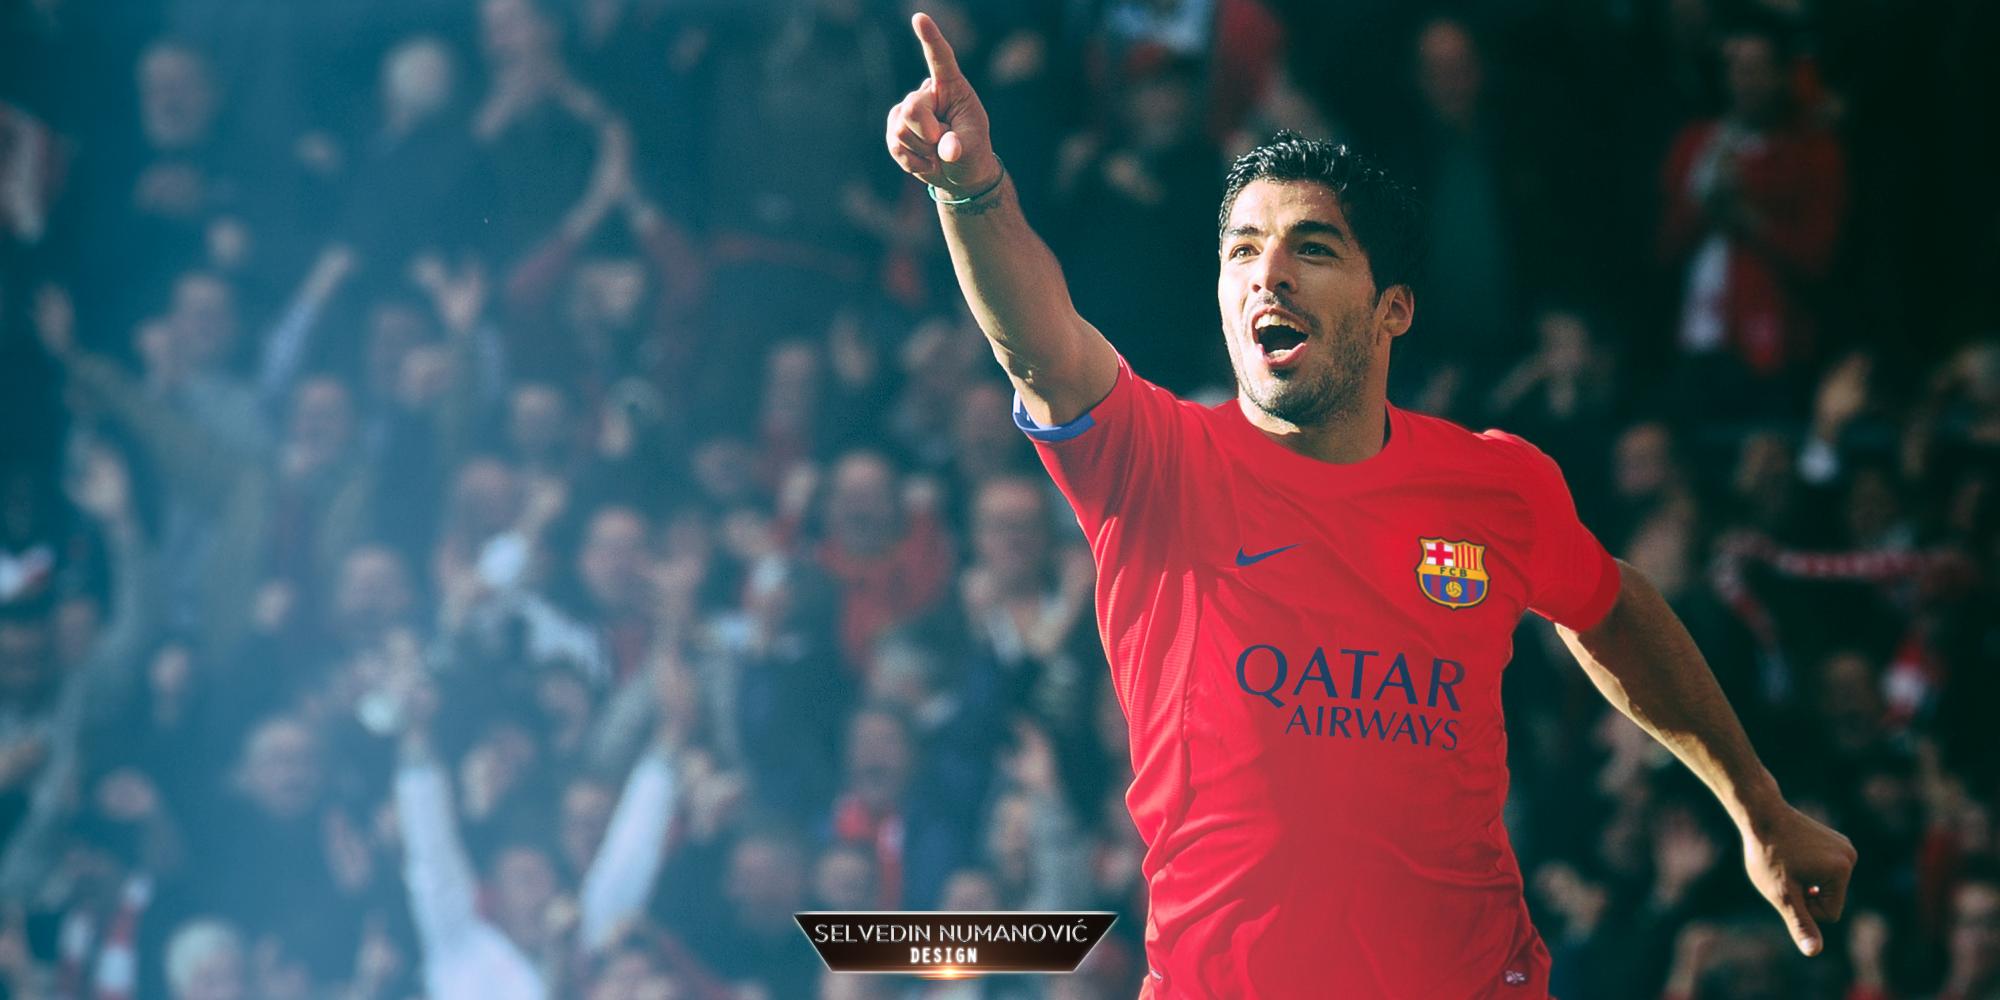 Luis Suarez FC Barcelona 201415 wallpaper by SelvedinFCB on 2000x1000